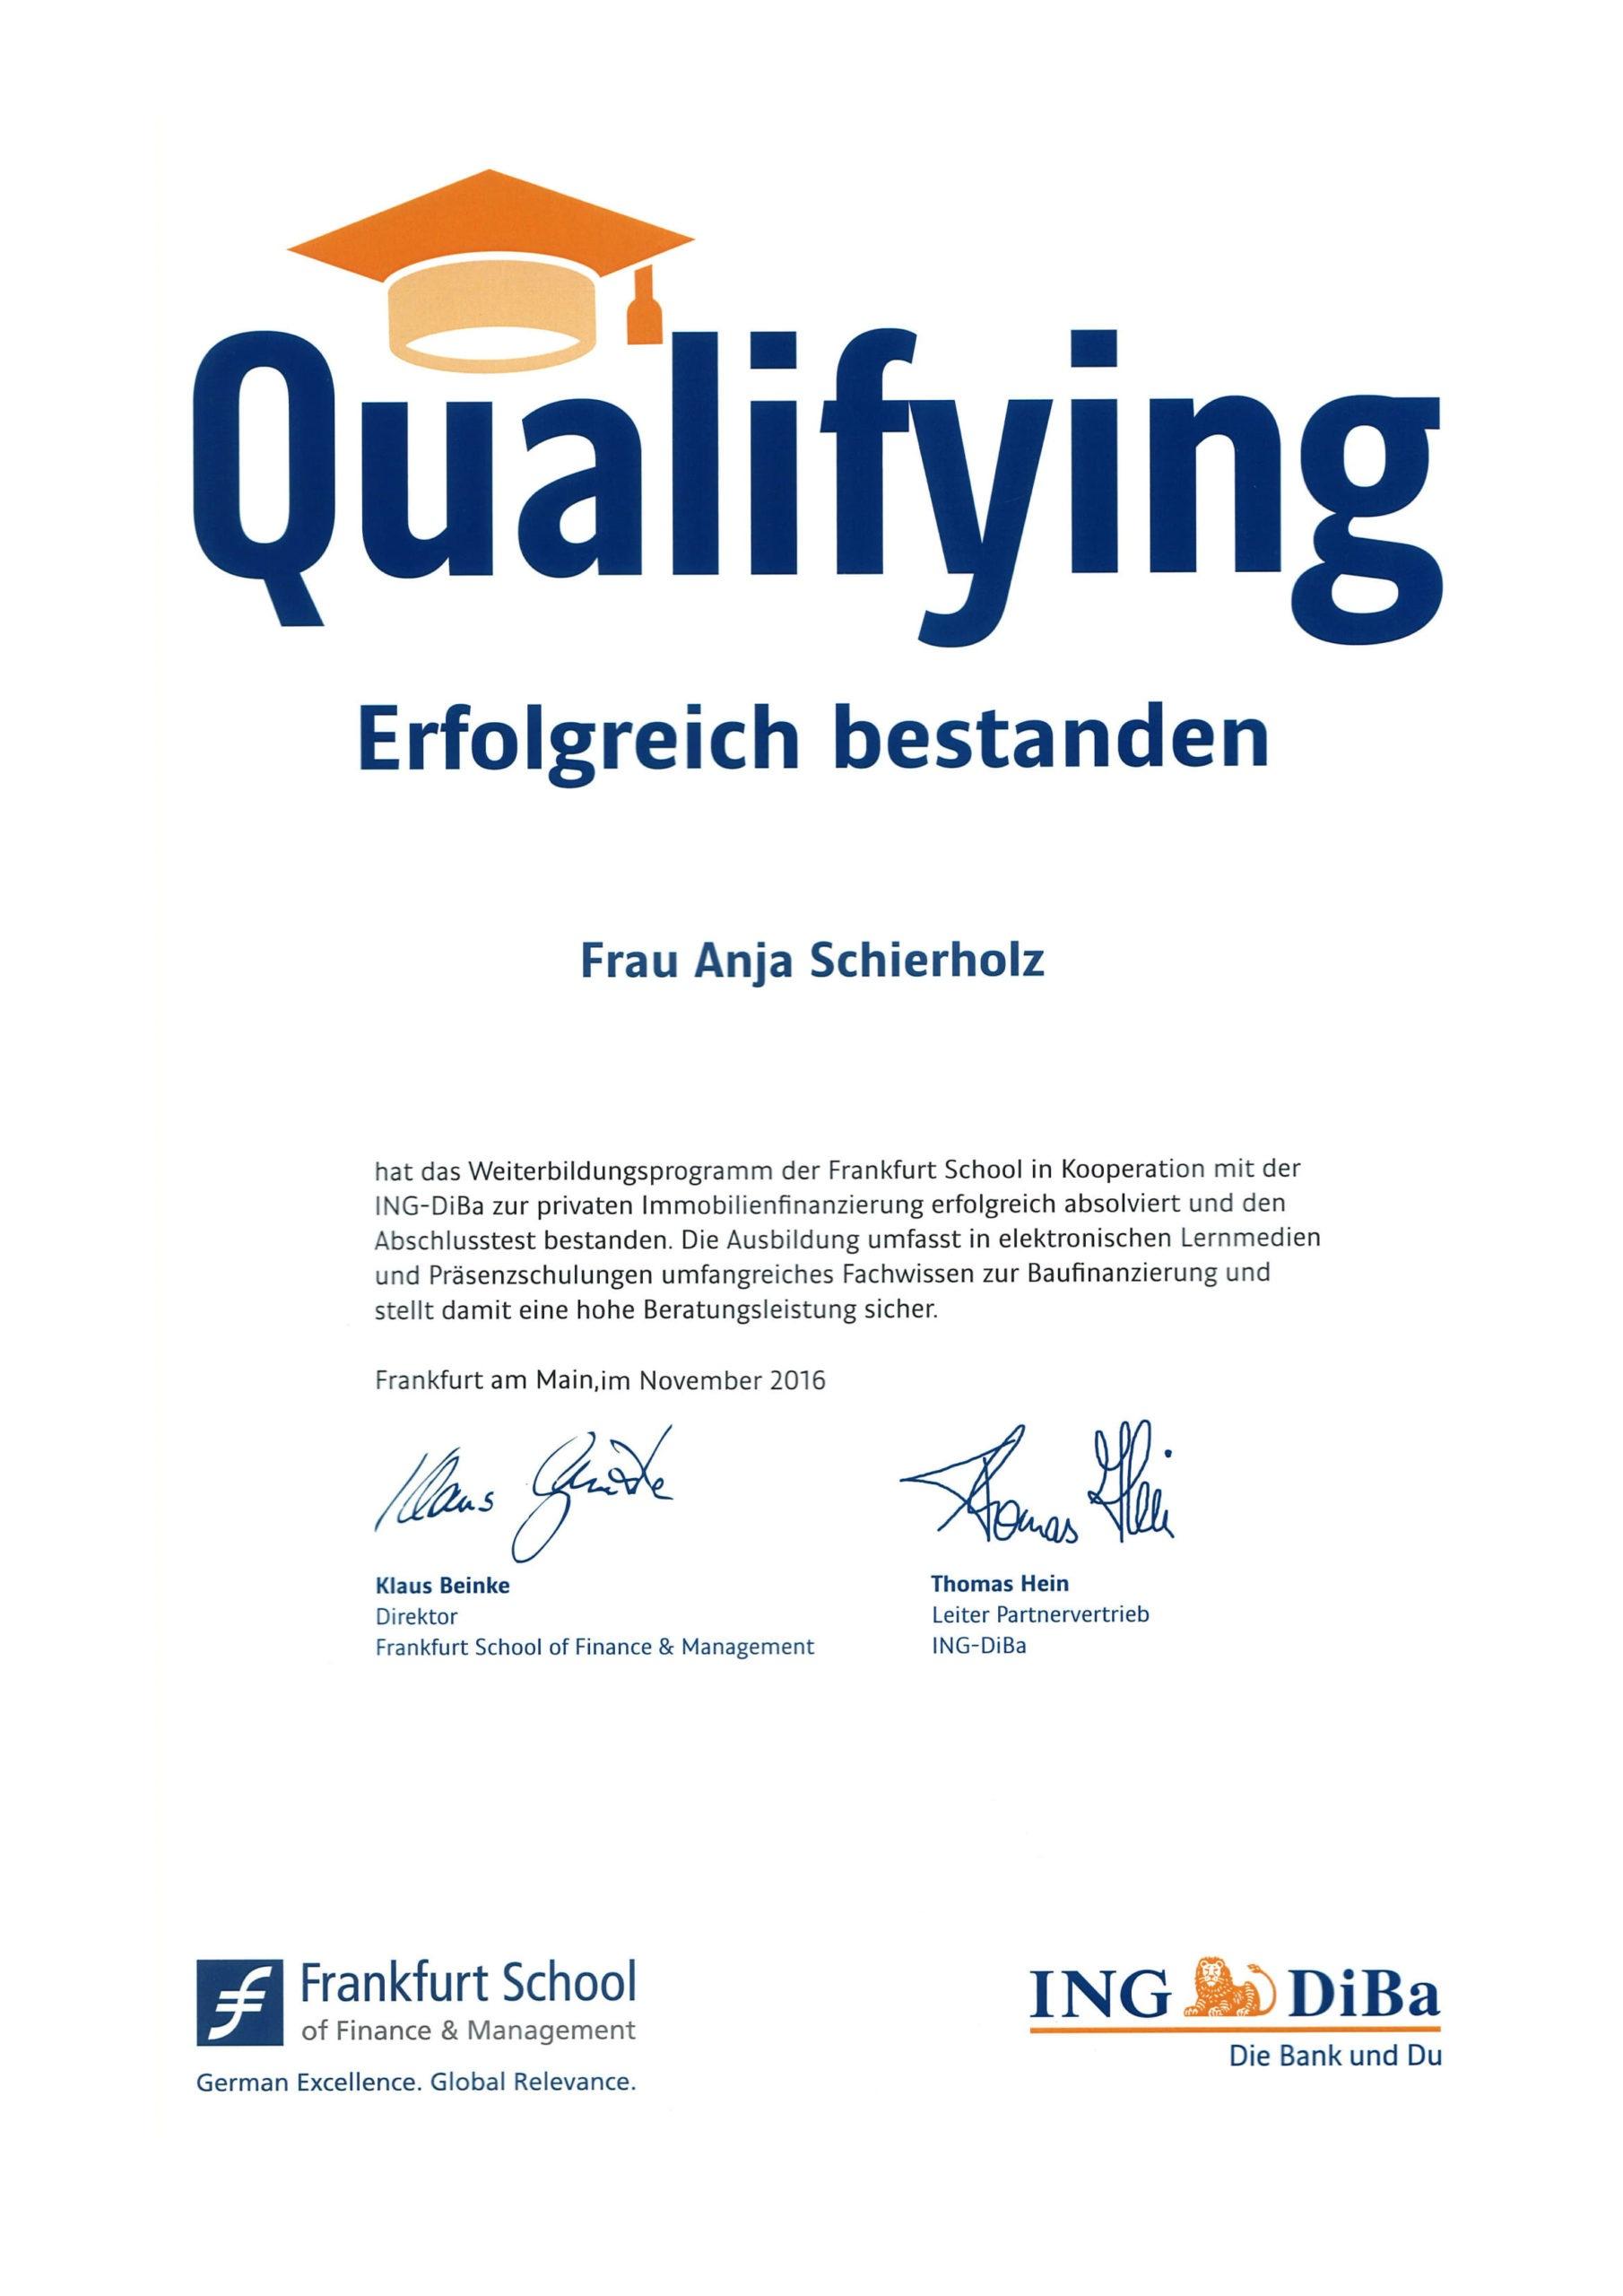 Urkunde-Anja-Willumeit-Frankfurt-School_Capitalium-Finanberater-Baufinanzierung-Hamburg-Kredit-Immobilienkauf-Matthias-Drews-Baufi